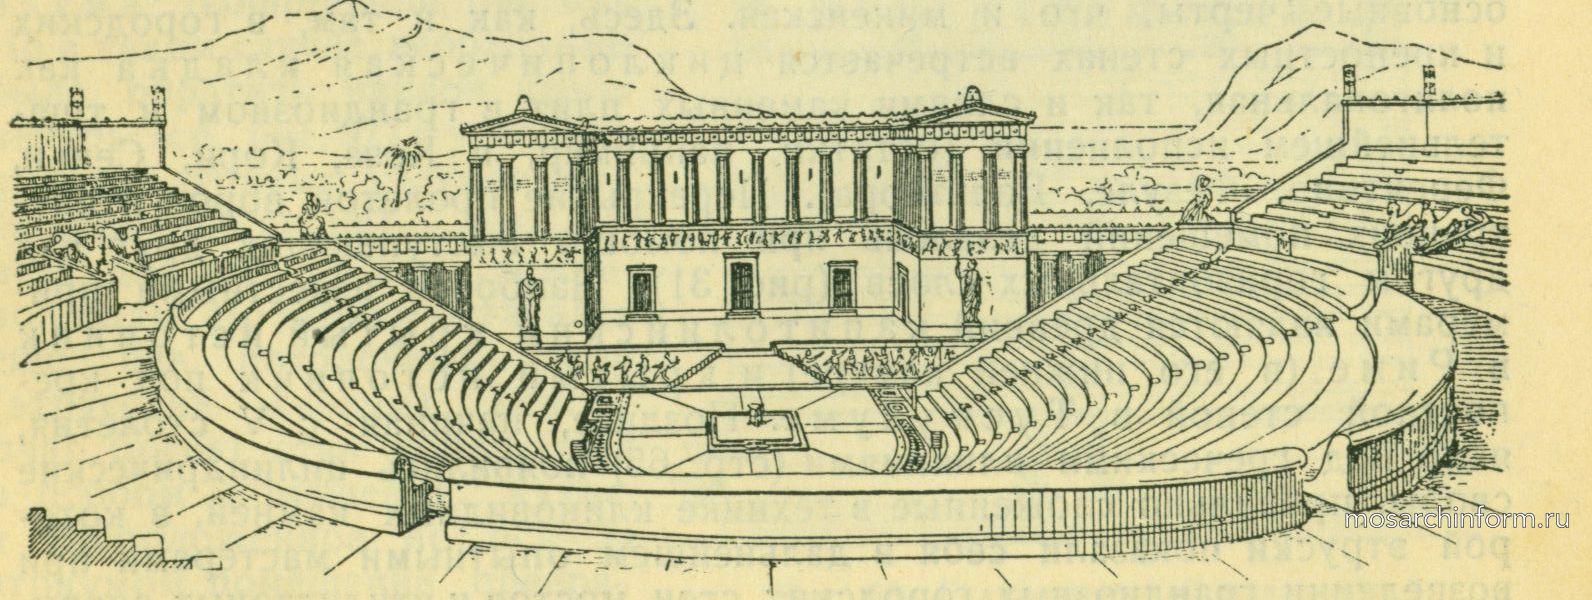 древнегреческий театр картинки карандашом